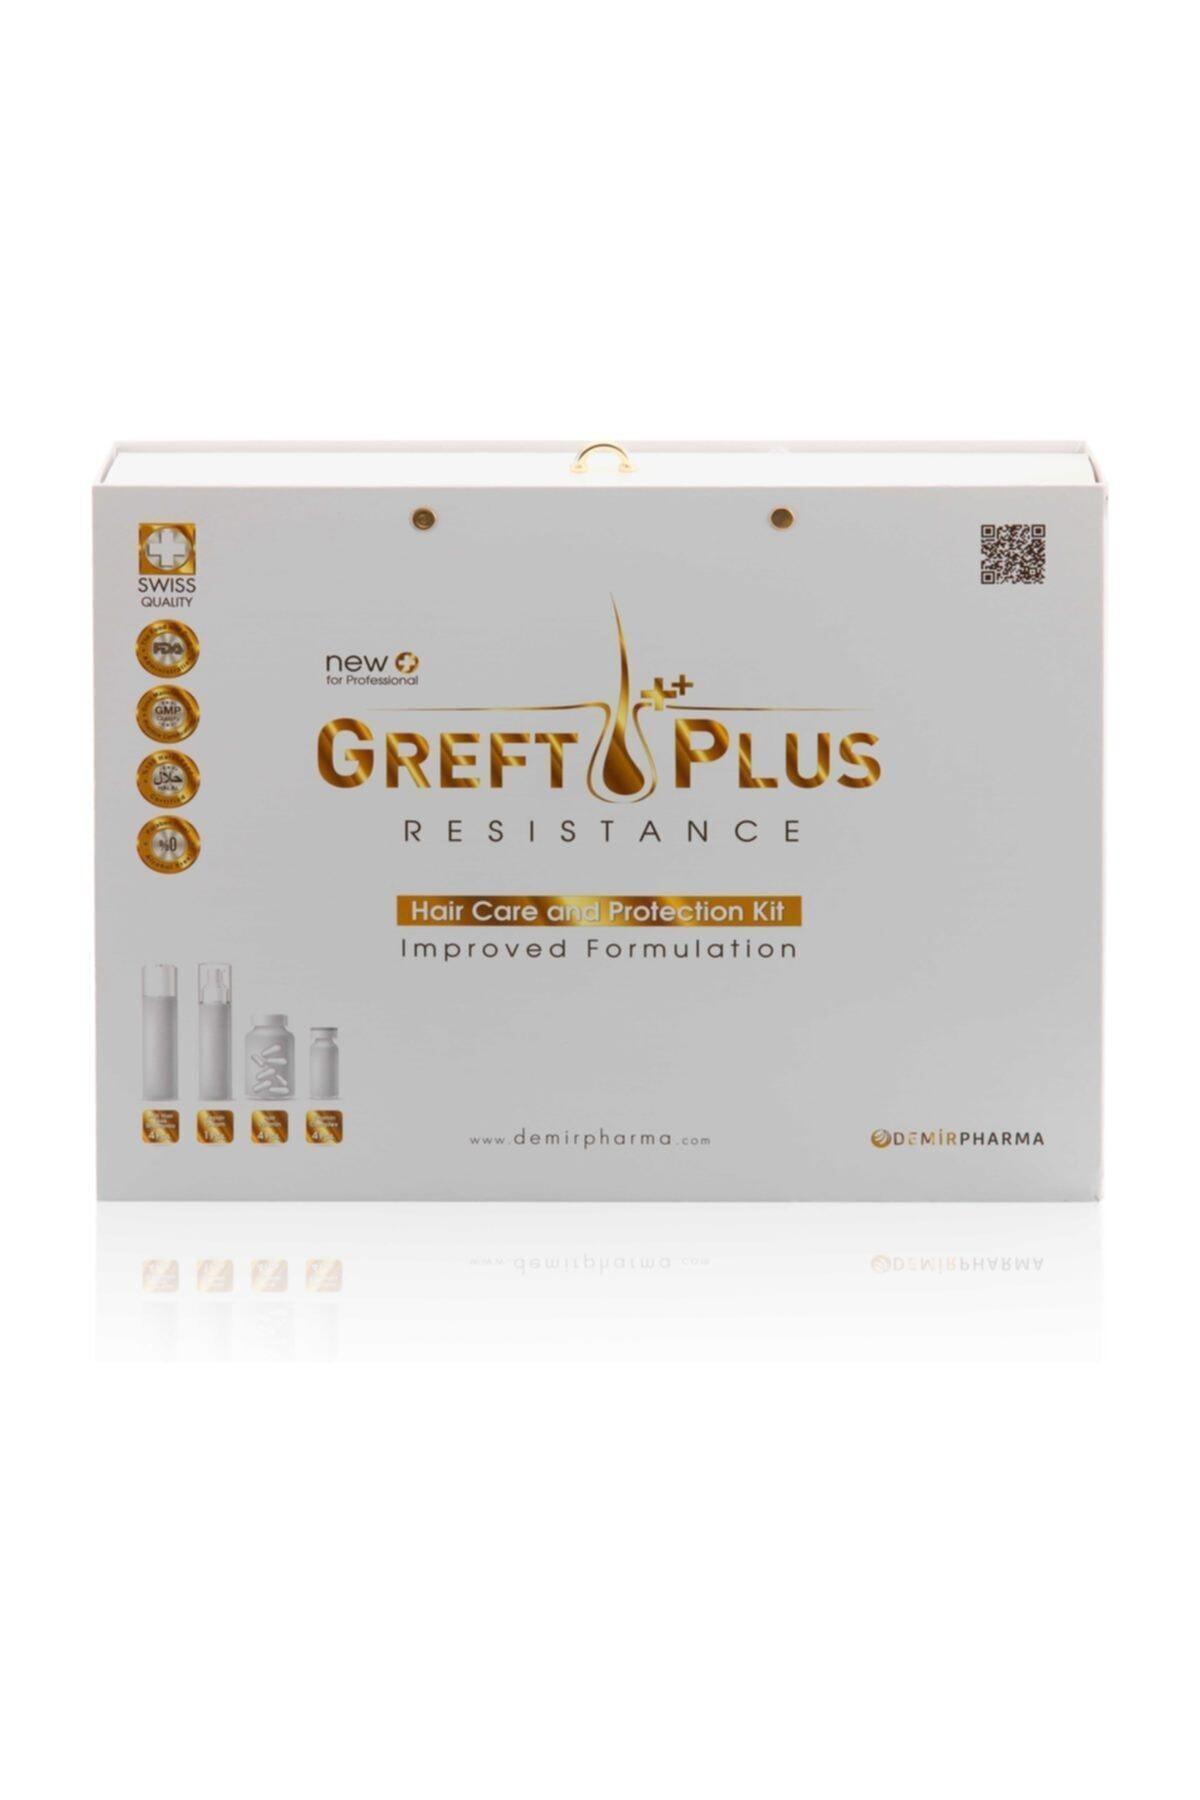 Greft Plus 6 Aylık Saç Bakım Seti Hair Care And Protection Kit